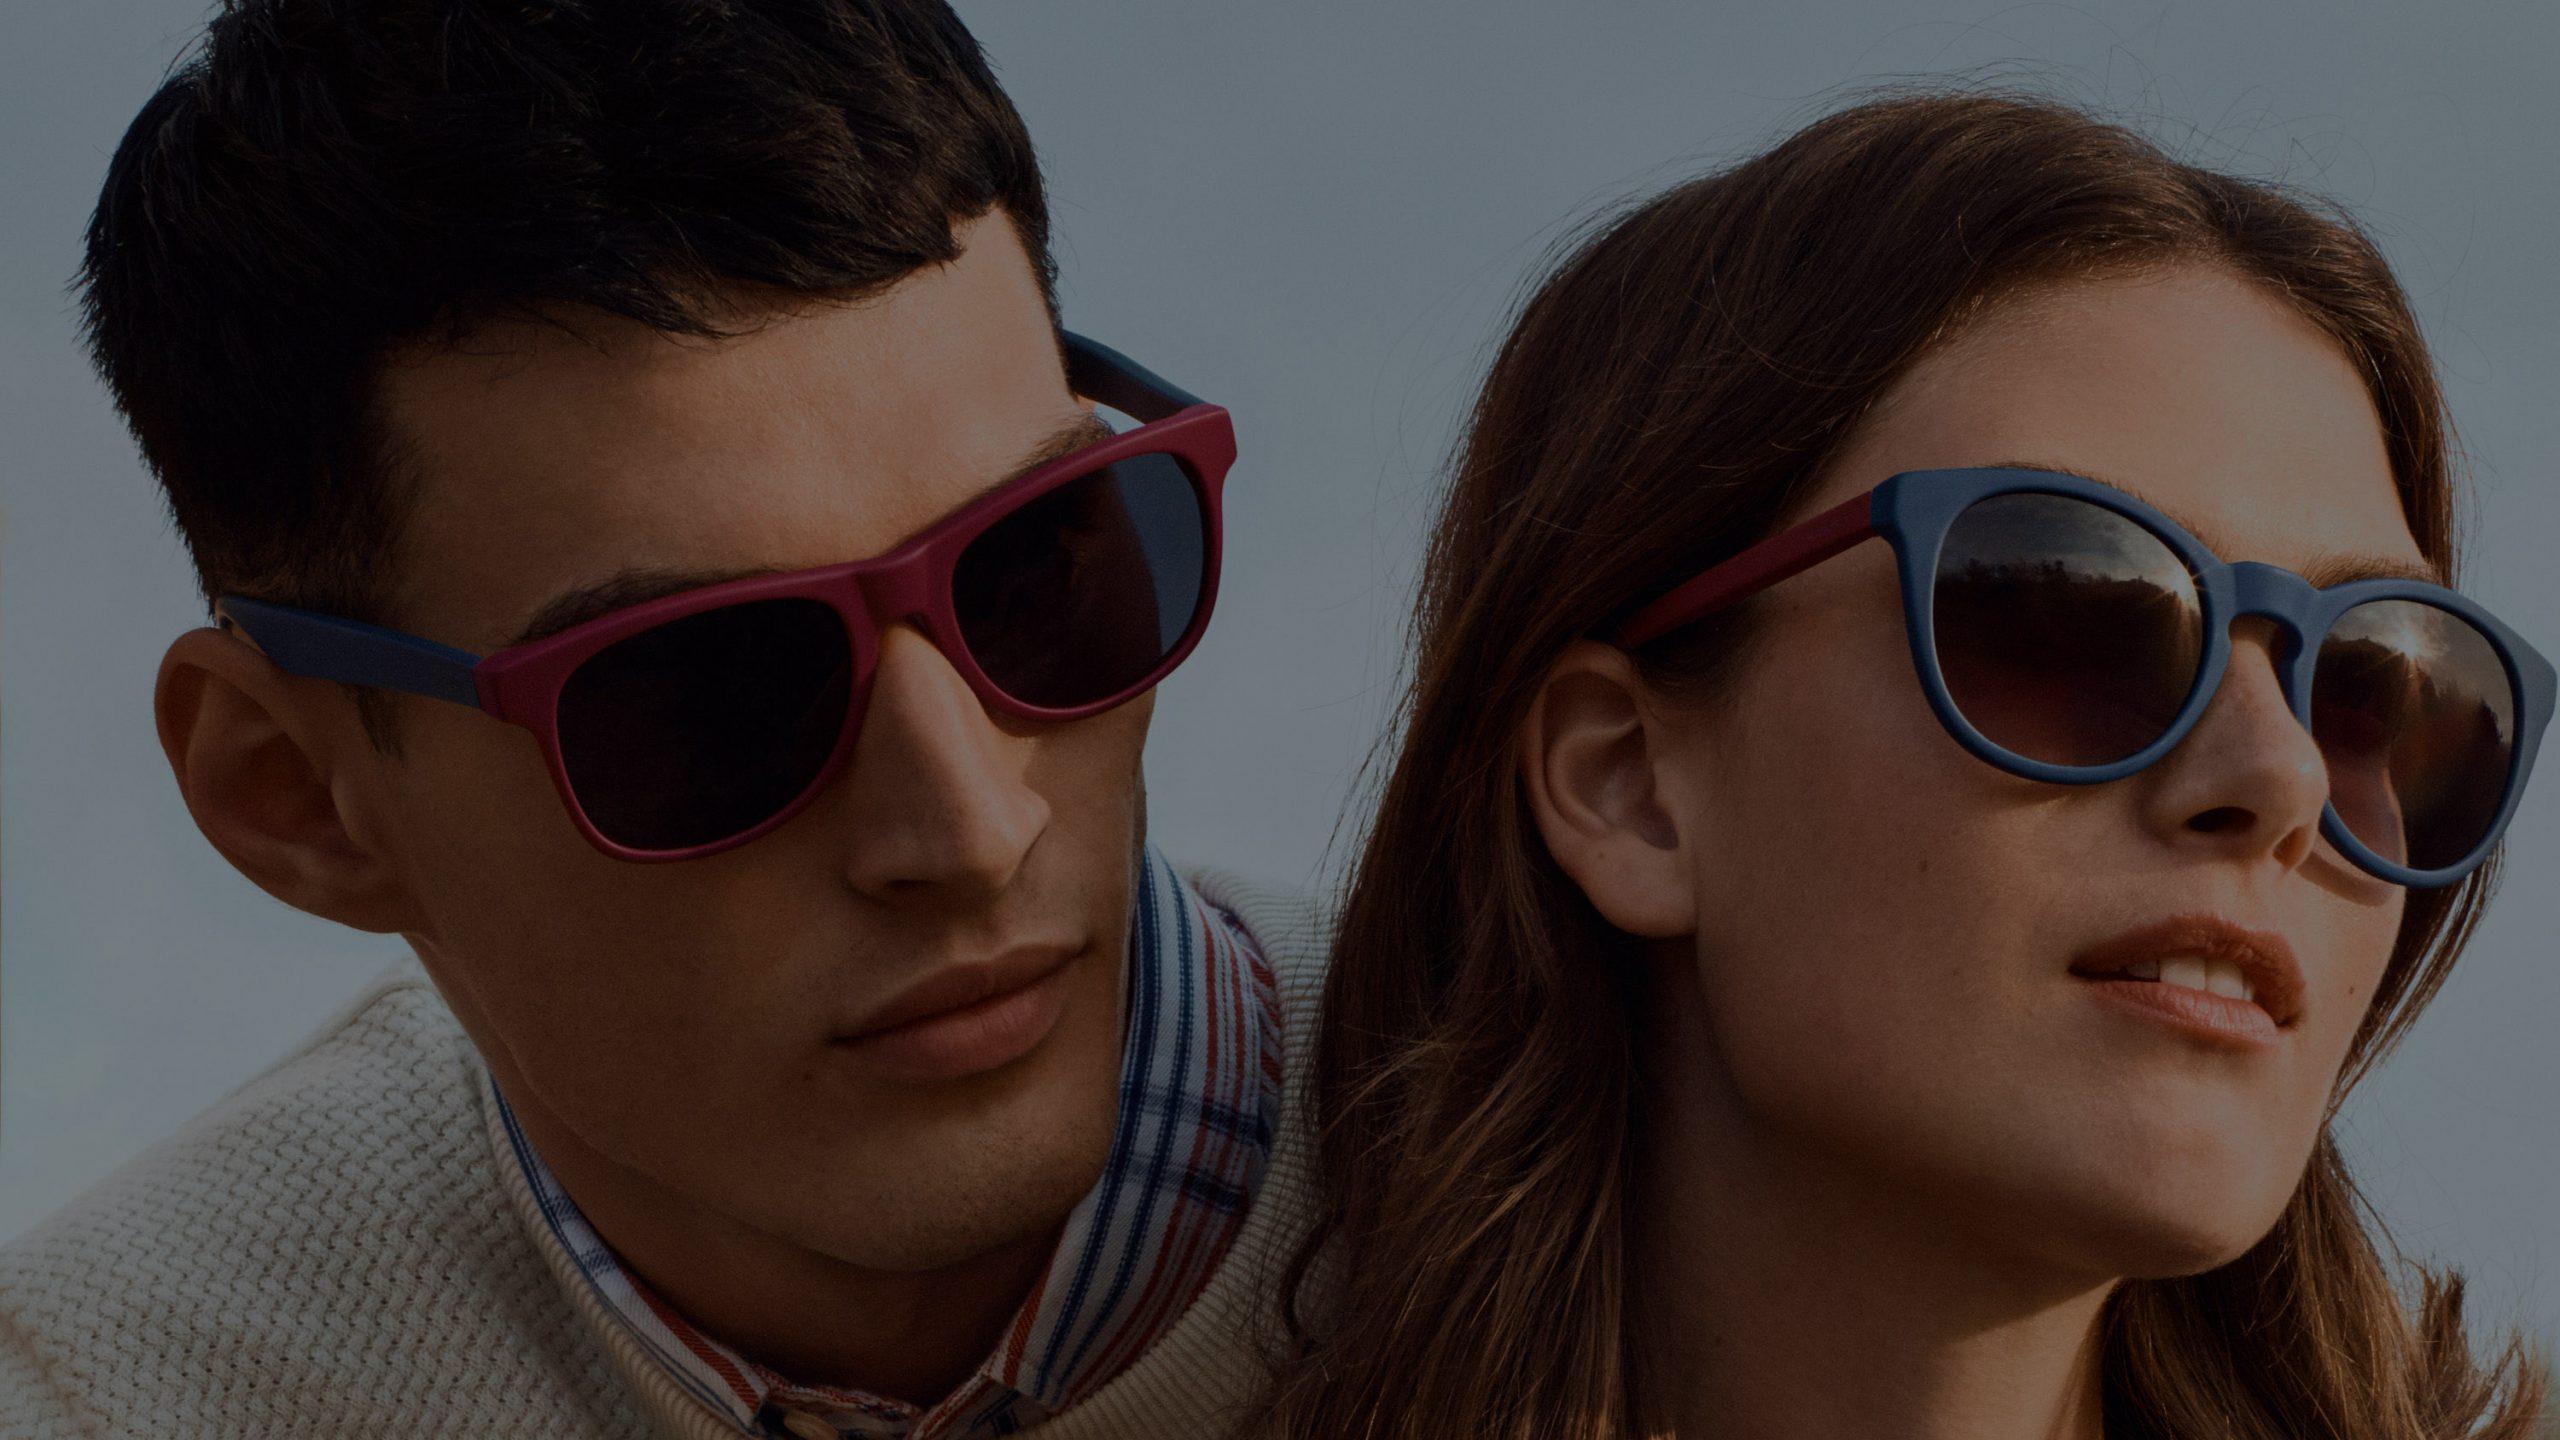 Gafas progressivas antireflejantes o solares